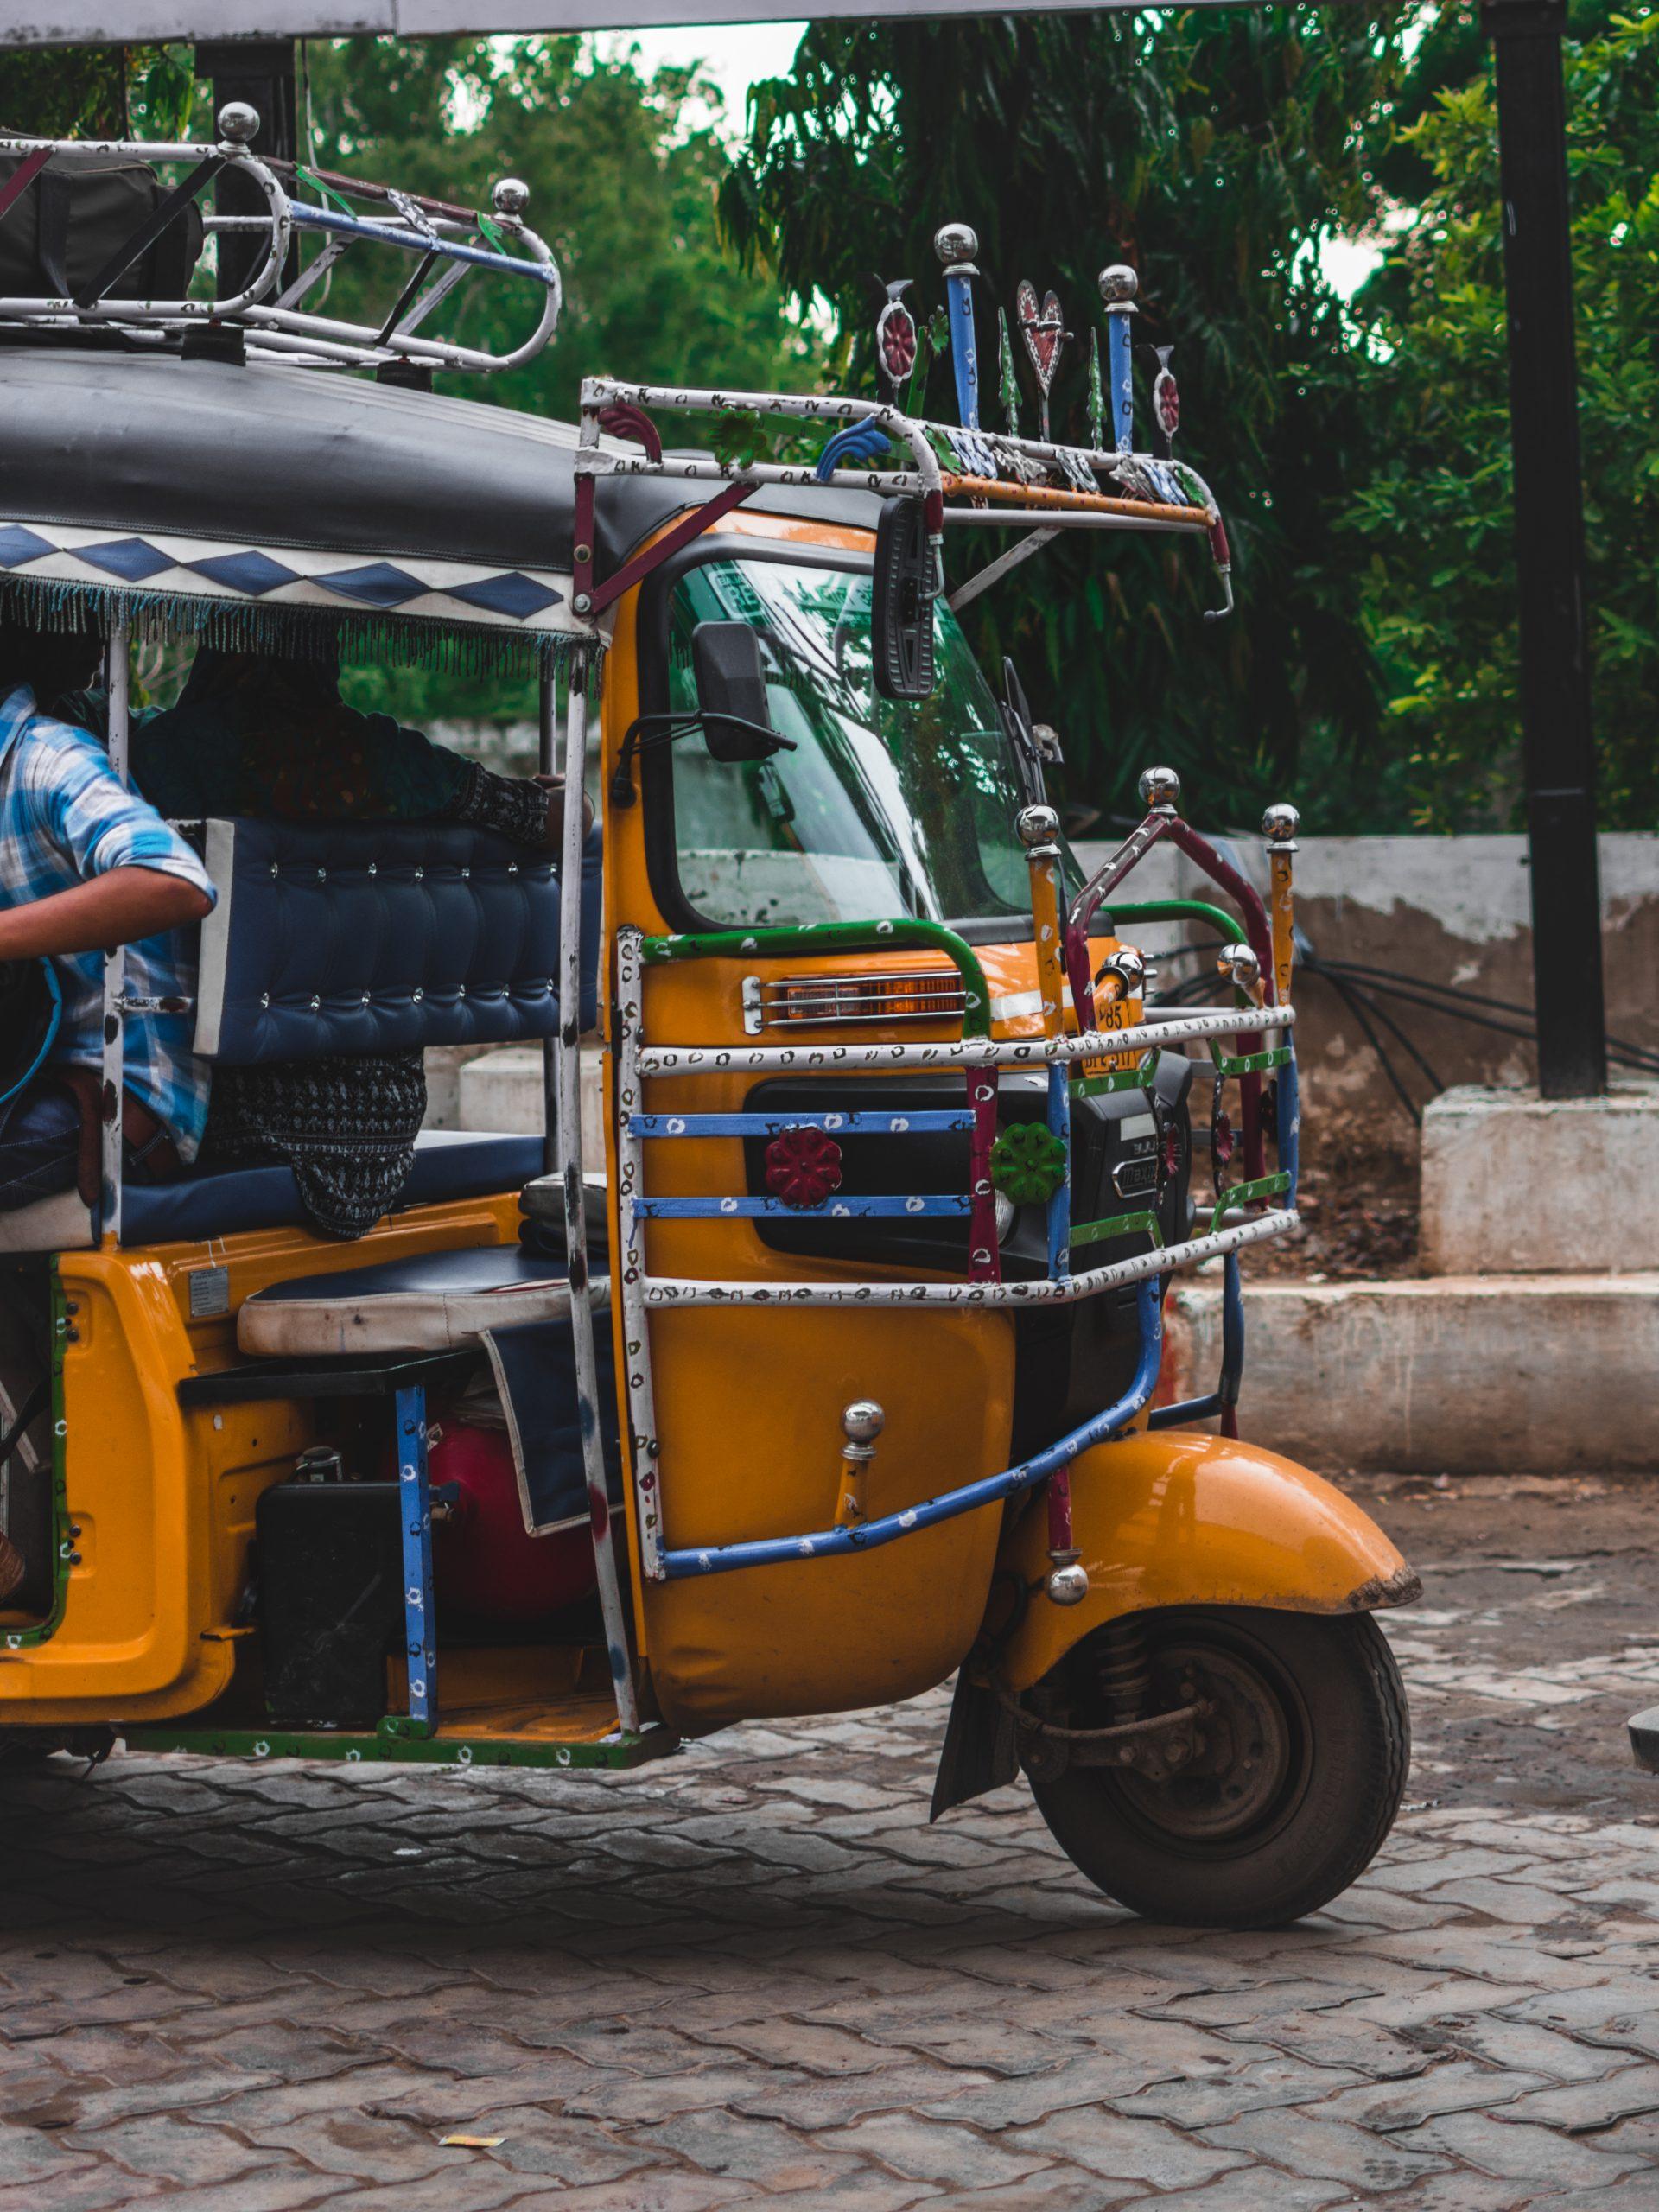 Parked Rickshaw